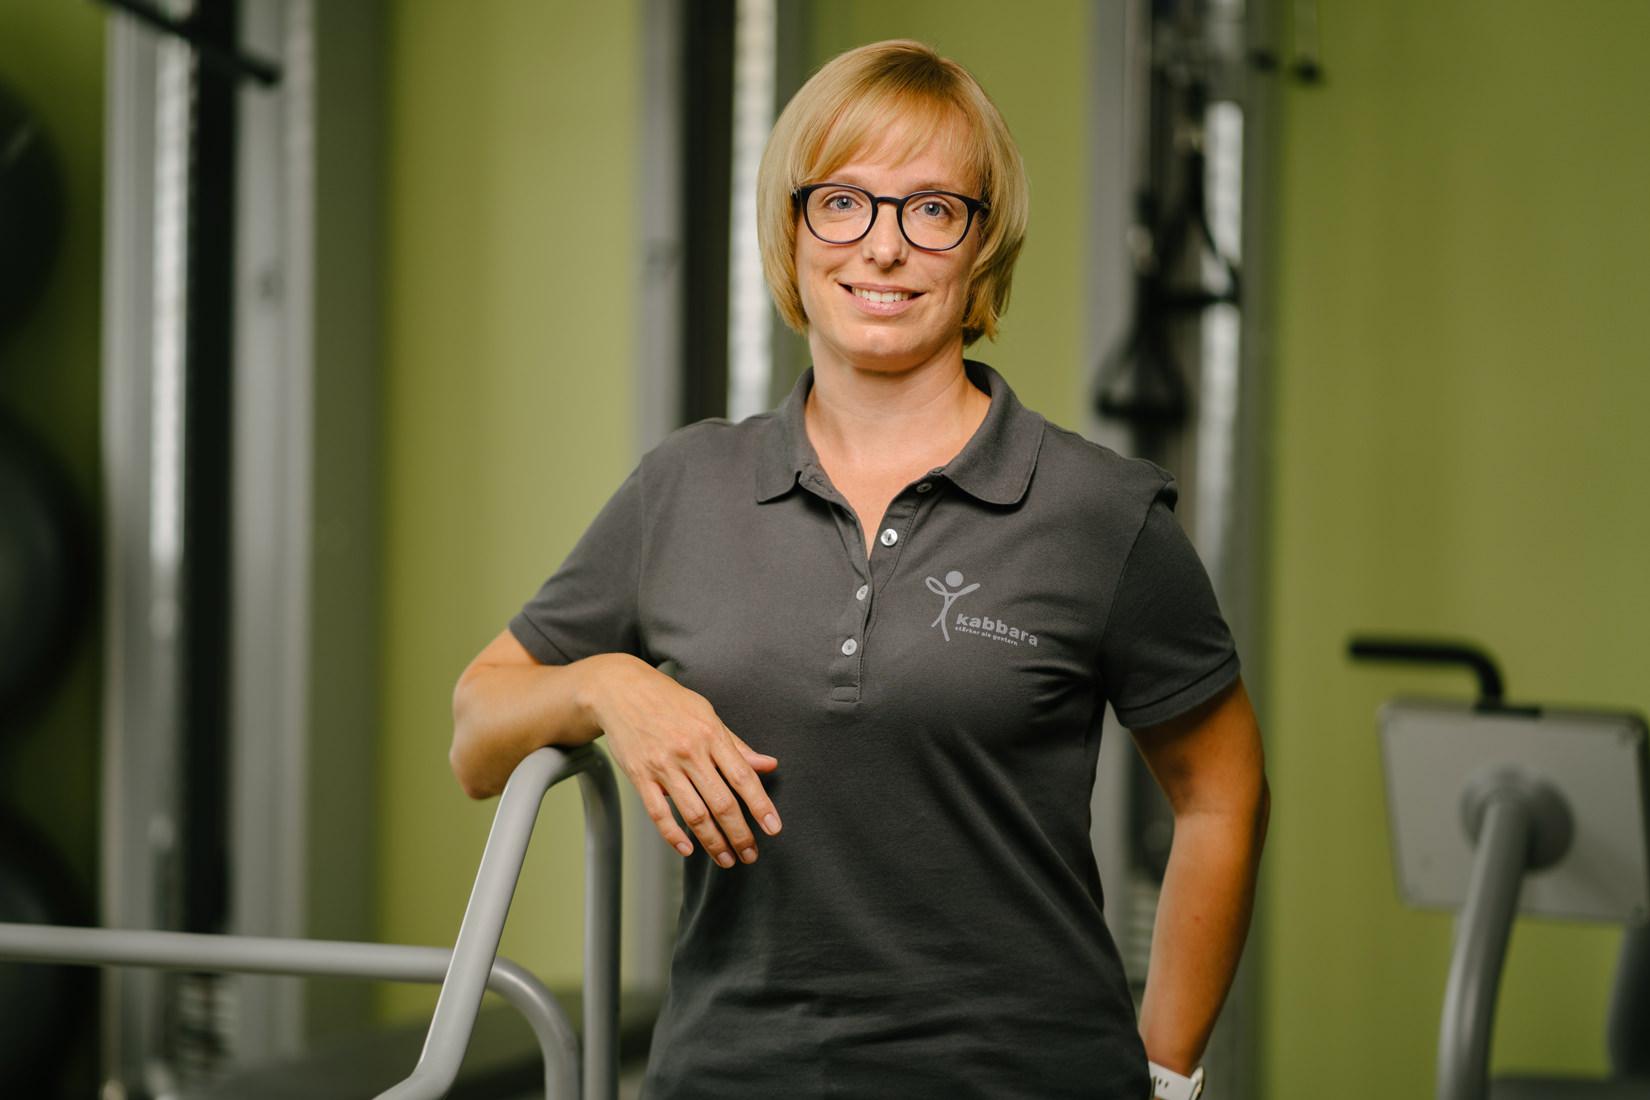 Physiotherapie Schorndorf - Deborah Thomas - Team